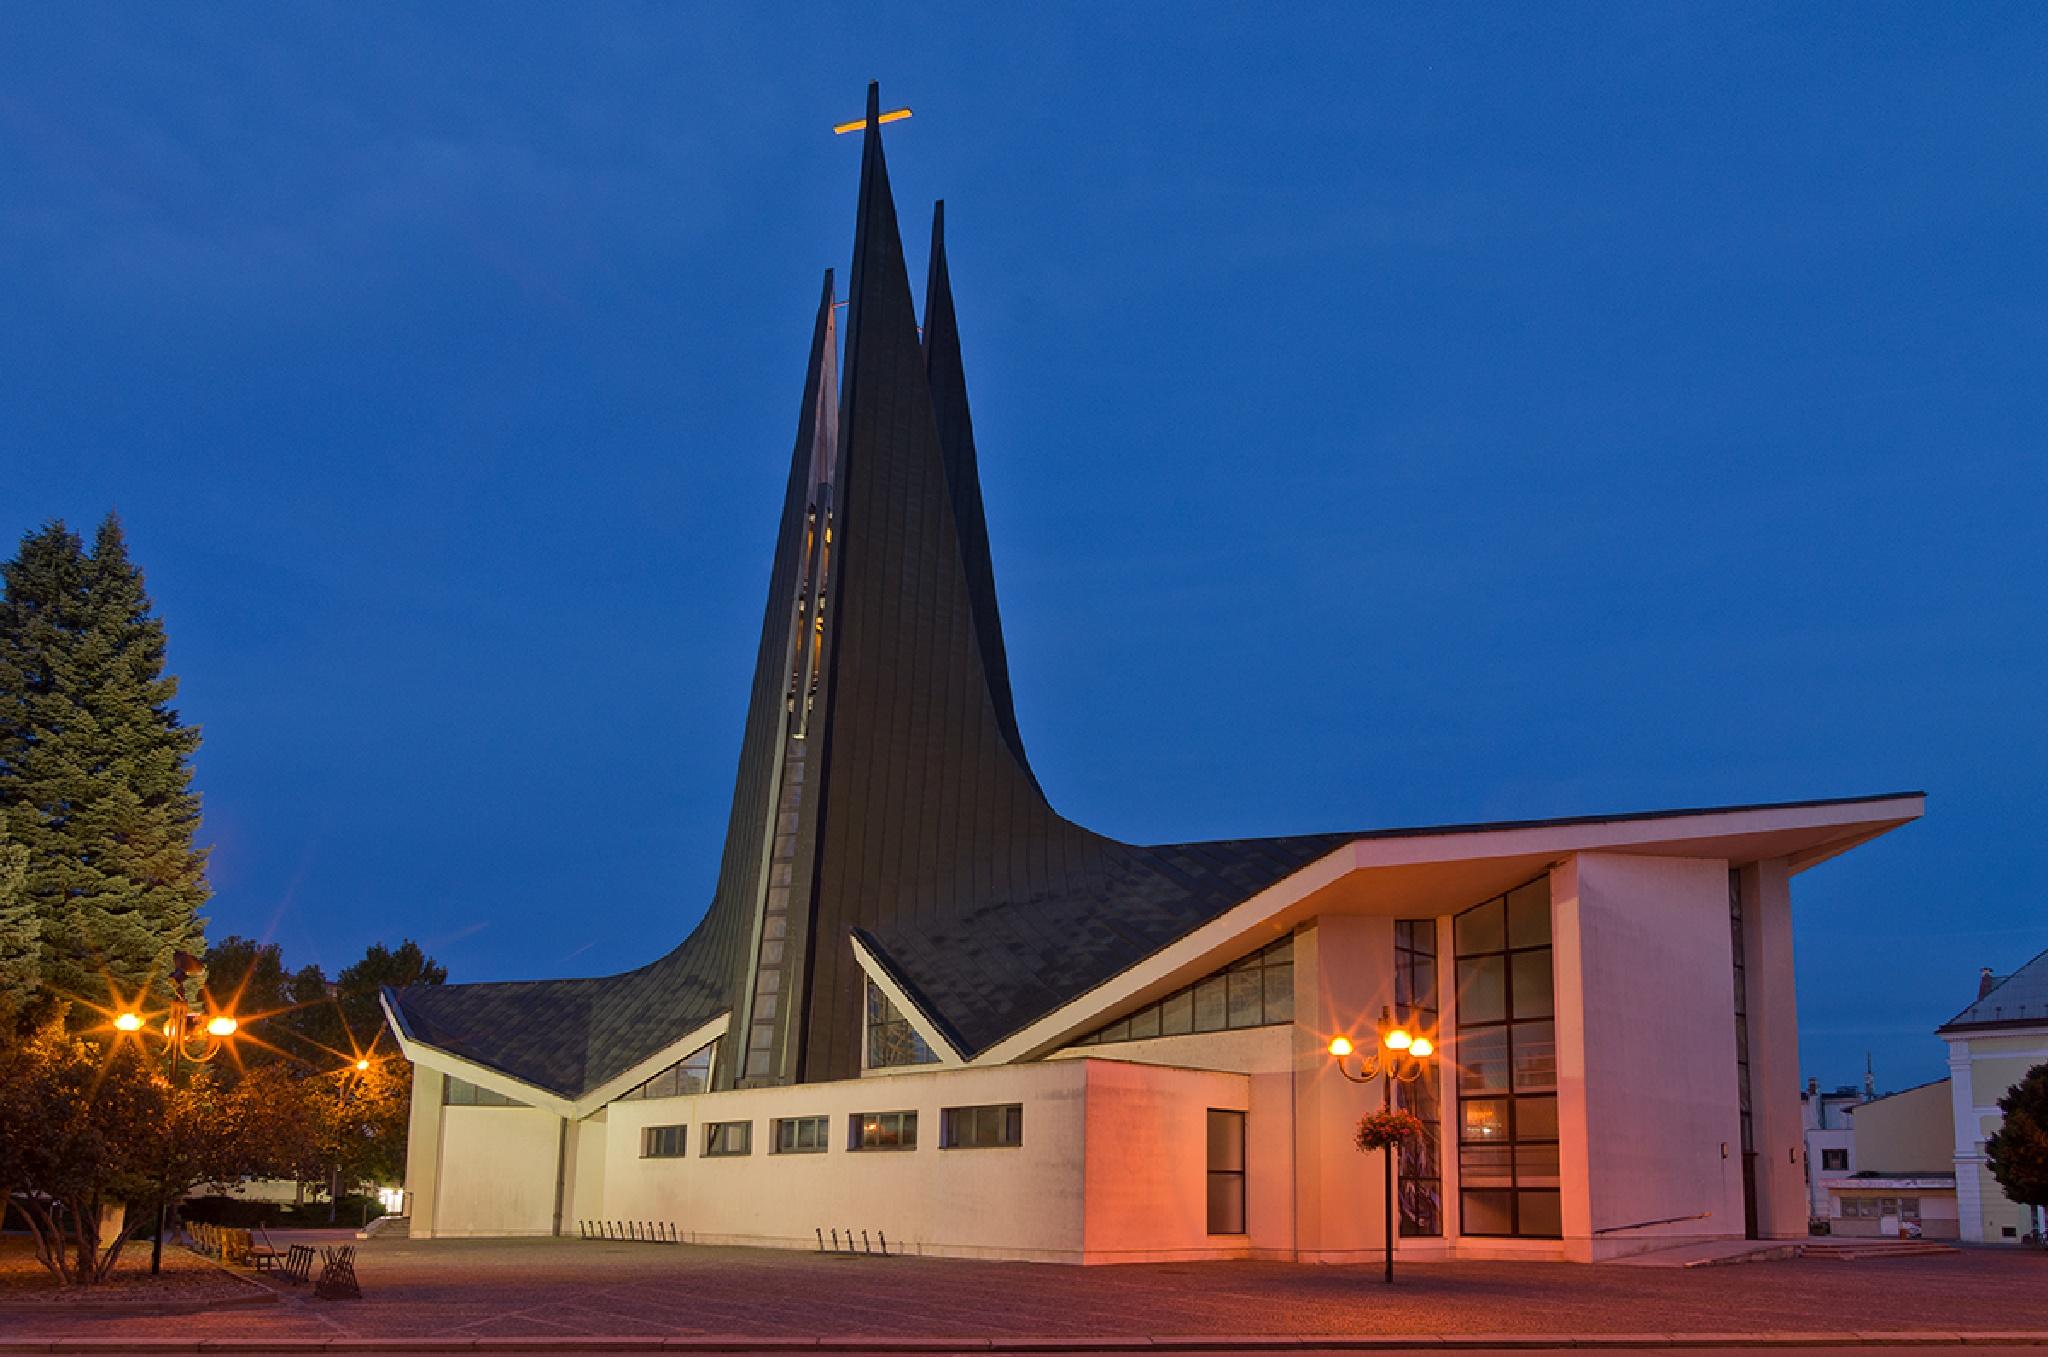 Modern church in Breclav by PetrS